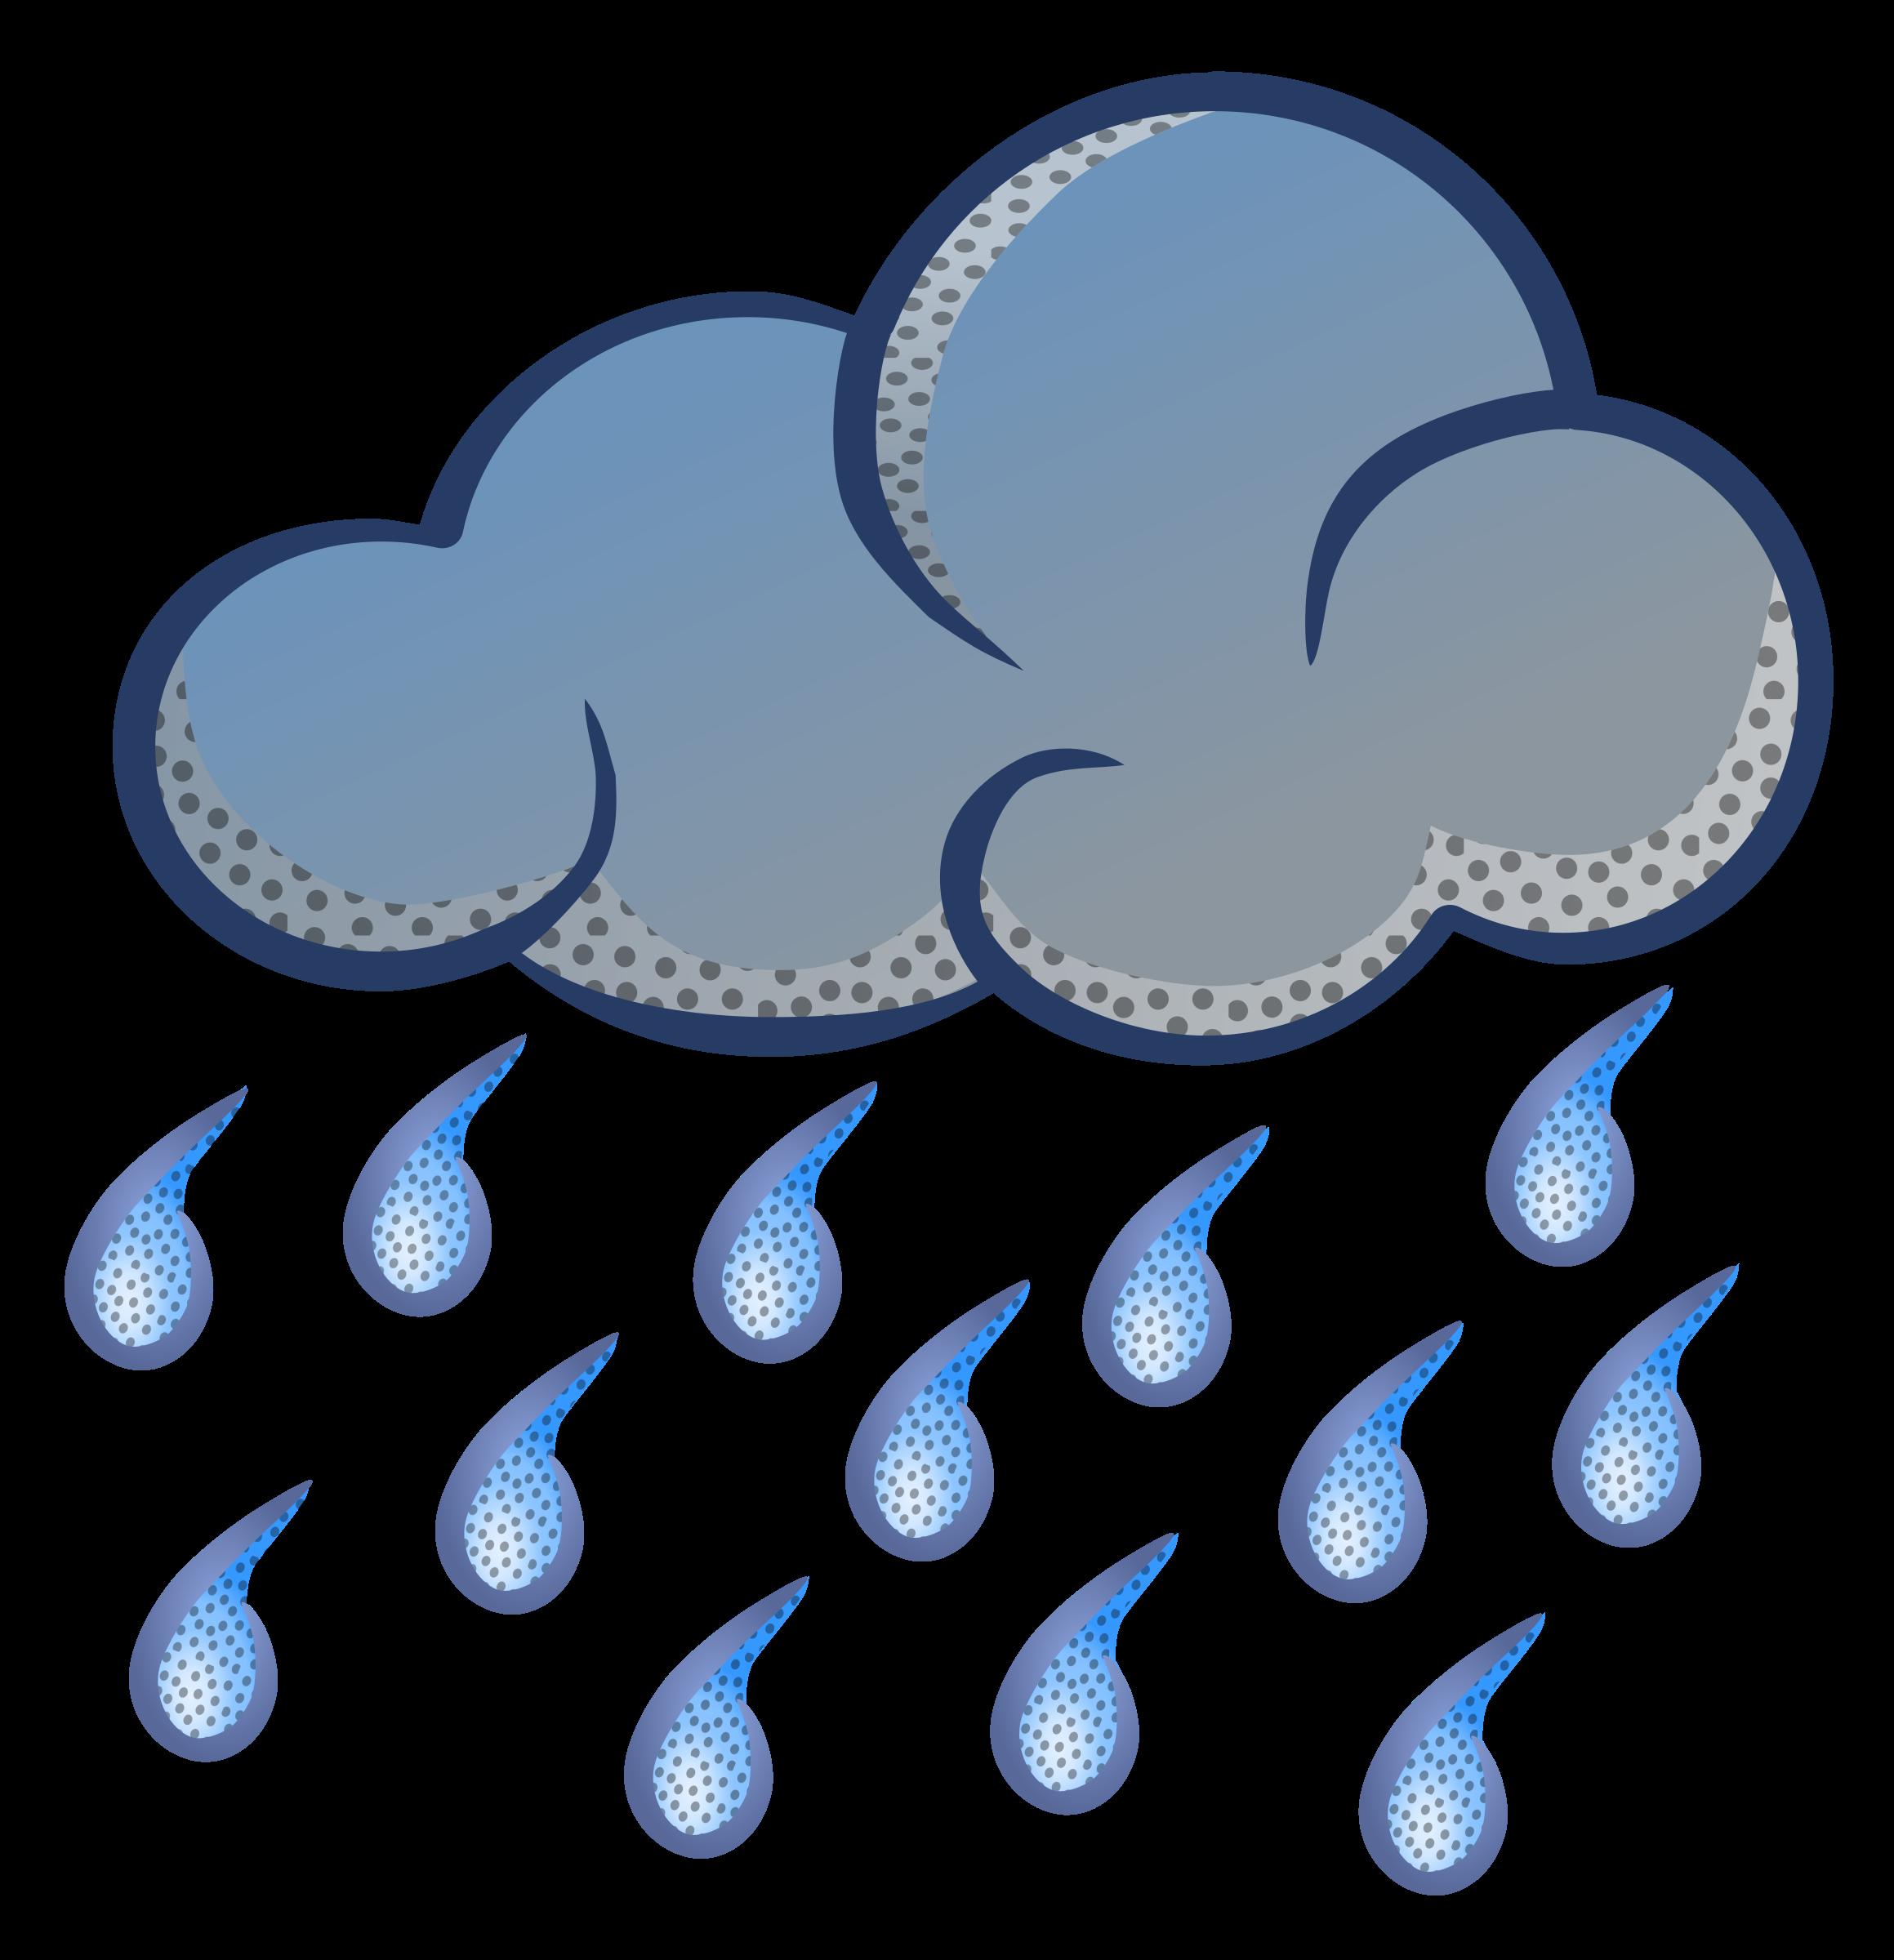 2319x2400 Free Rain Clipart Public Domain Rain Clip Art Images And Graphics